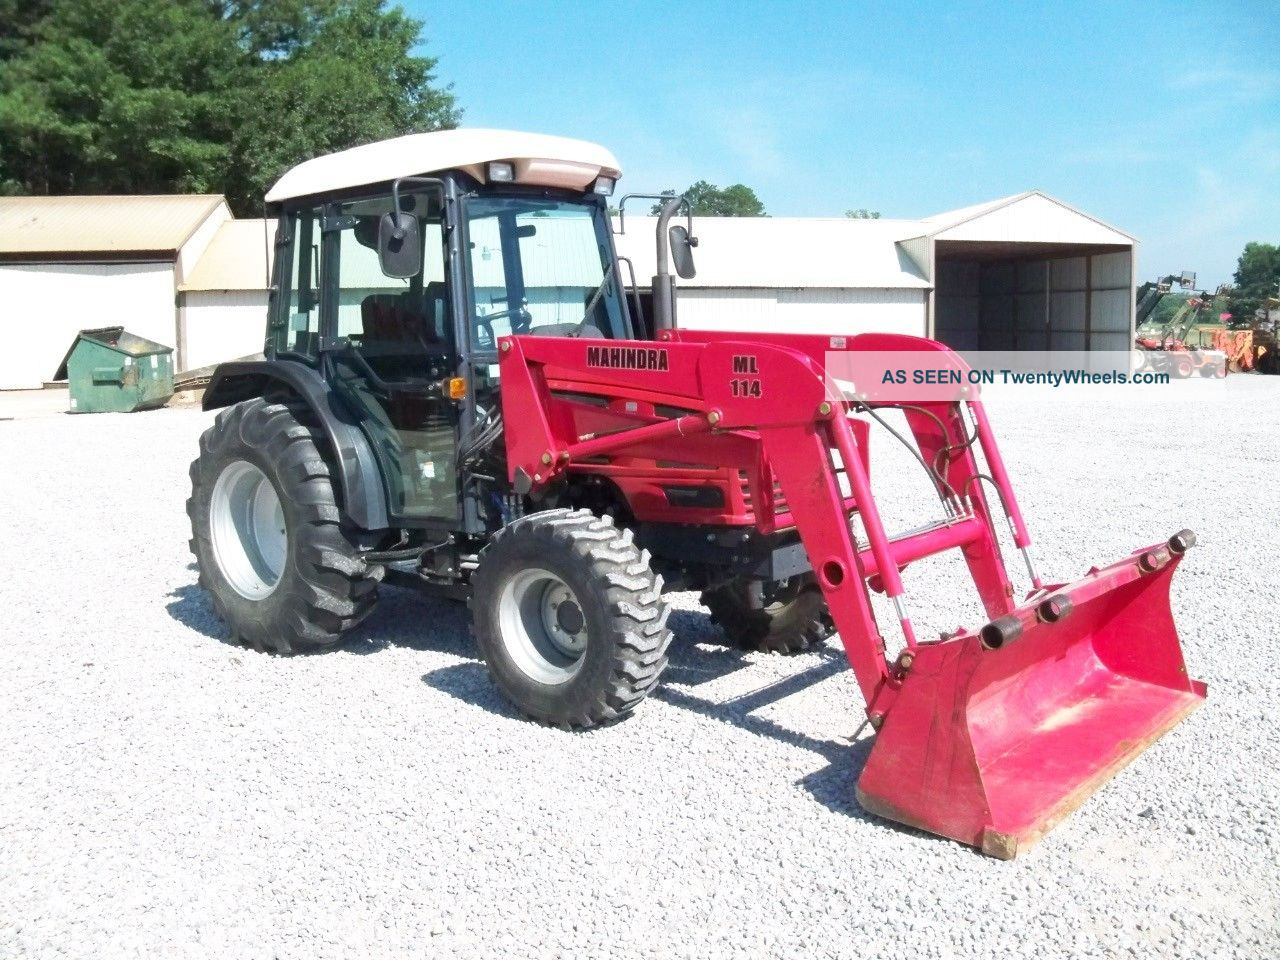 2008 Mahindra 4510 Cab Tractor W/ Mahindra Front Loader - Farm Tractor ...